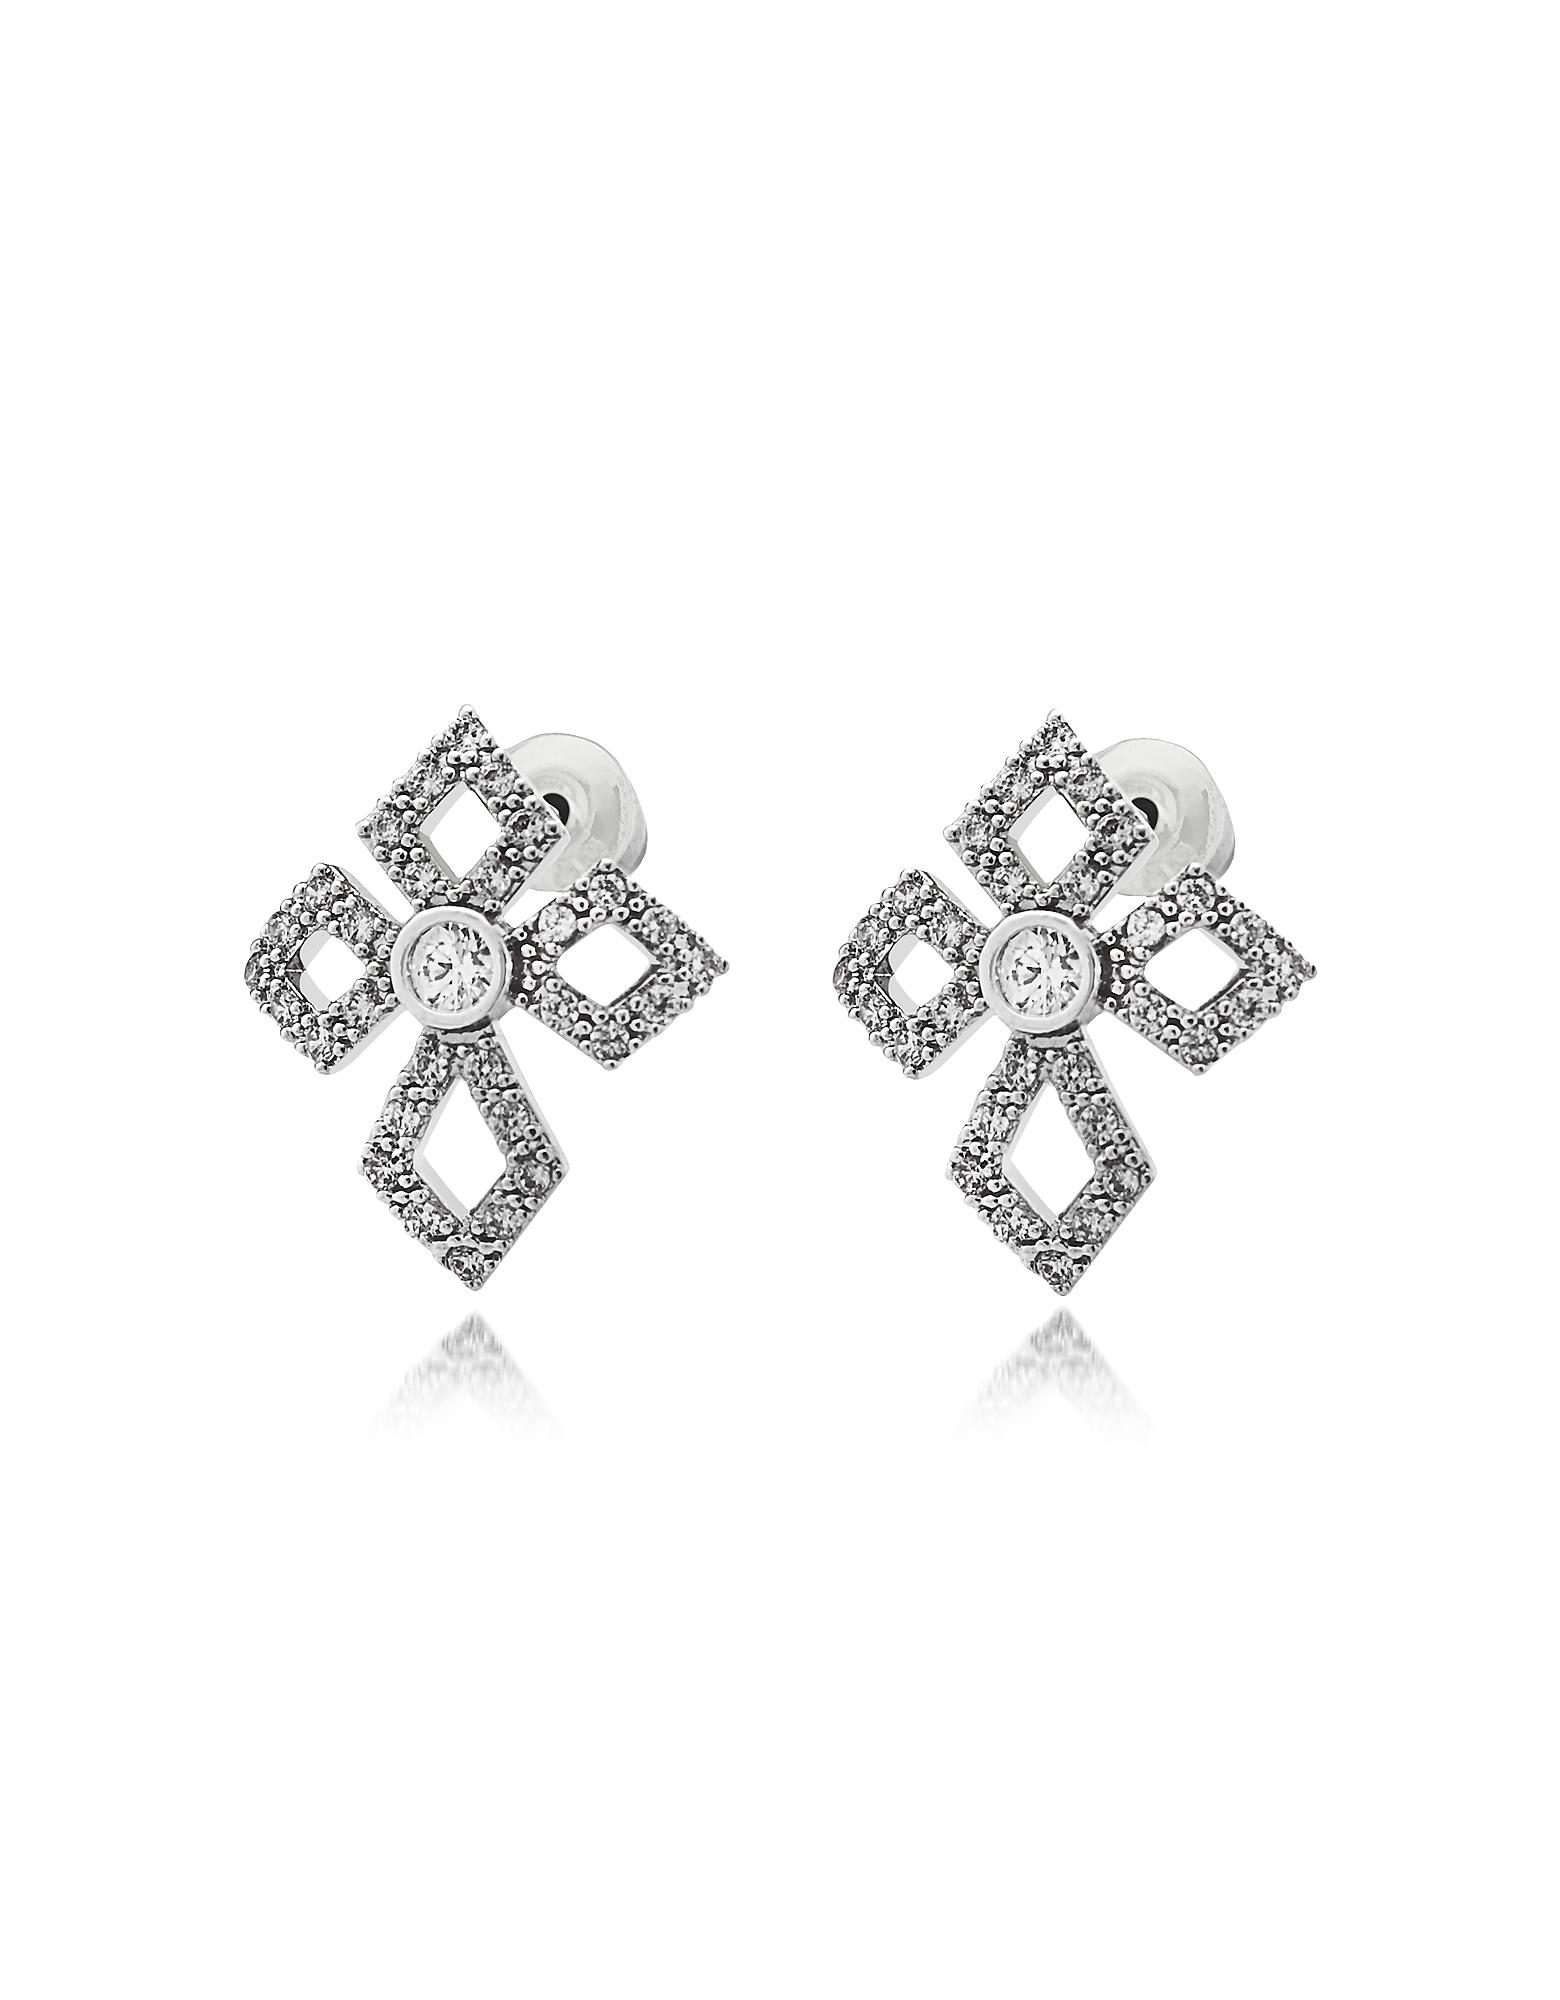 Federica Tosi Earrings, Sterling Silver Lobo Cross Earrings w/Crystals